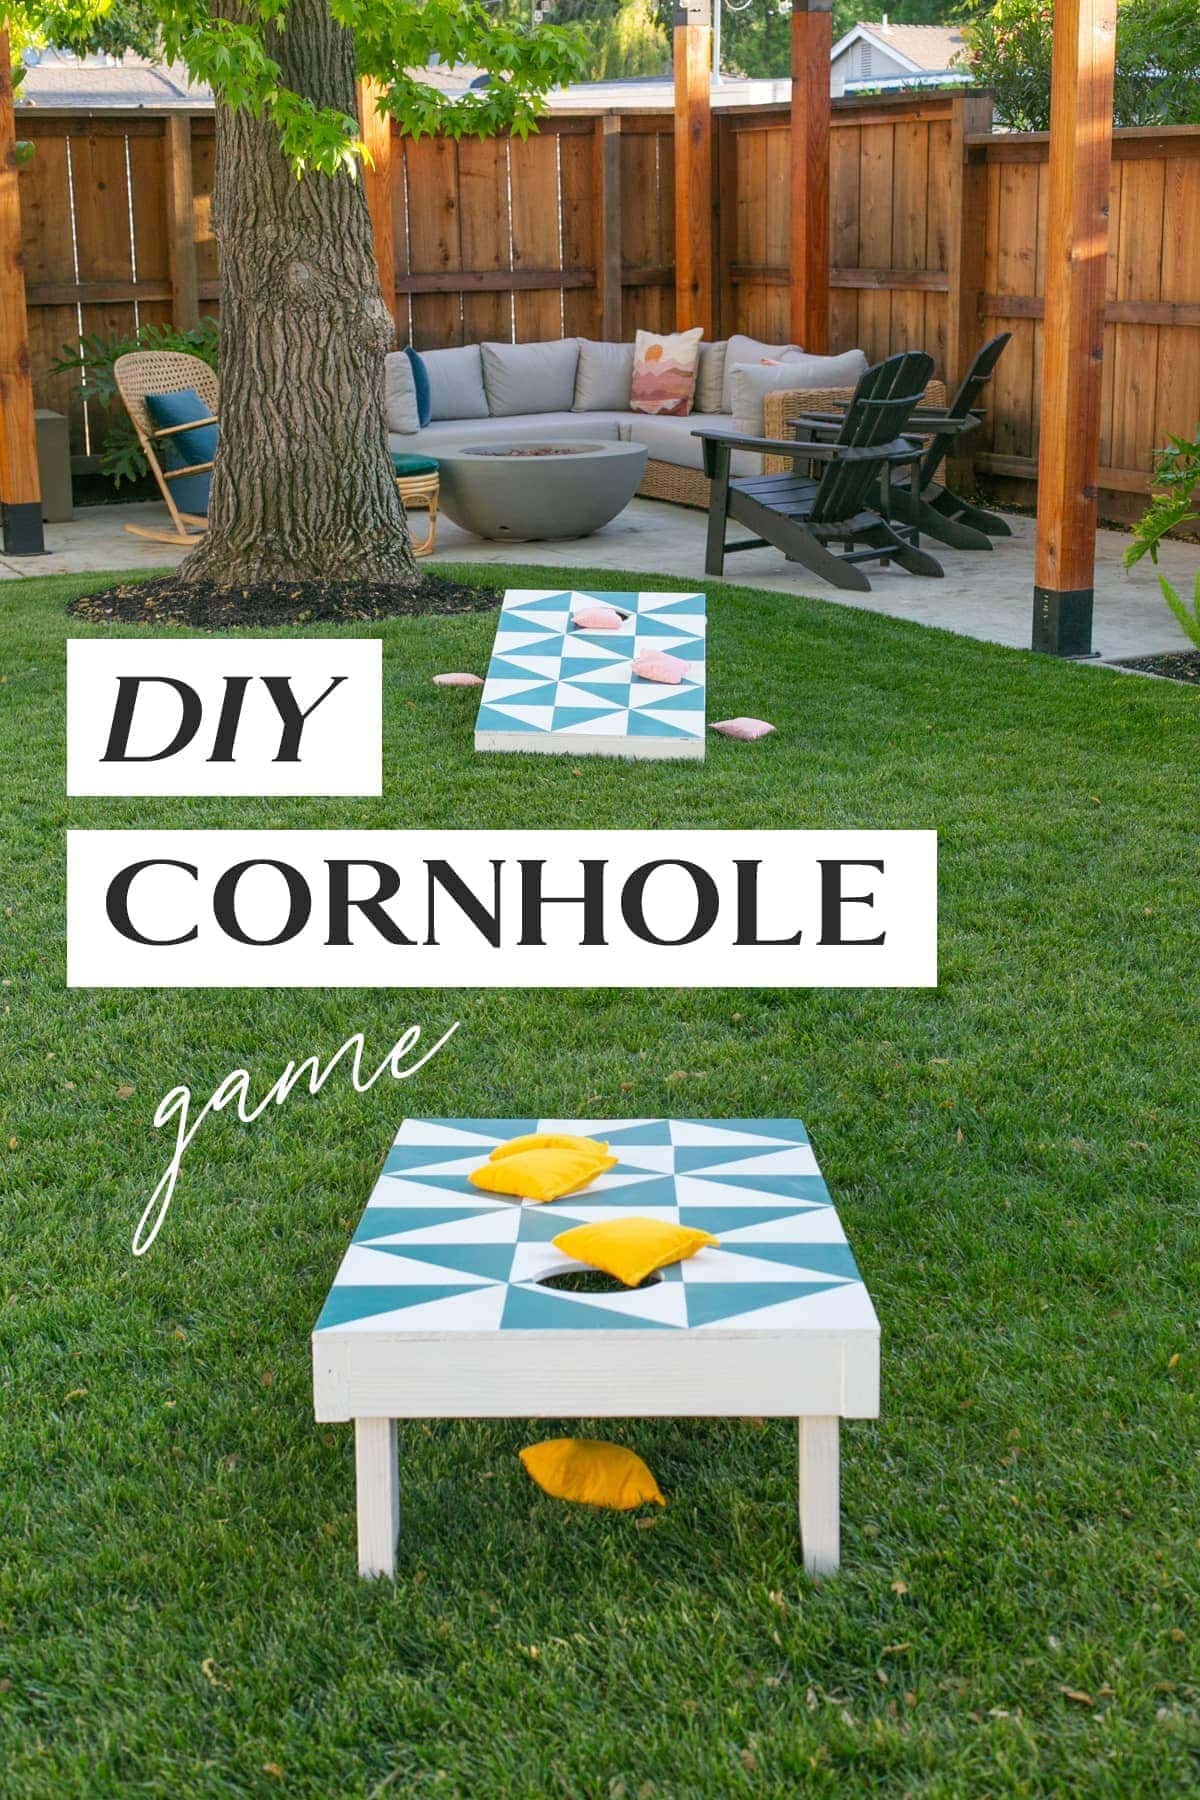 diy cornhole játék